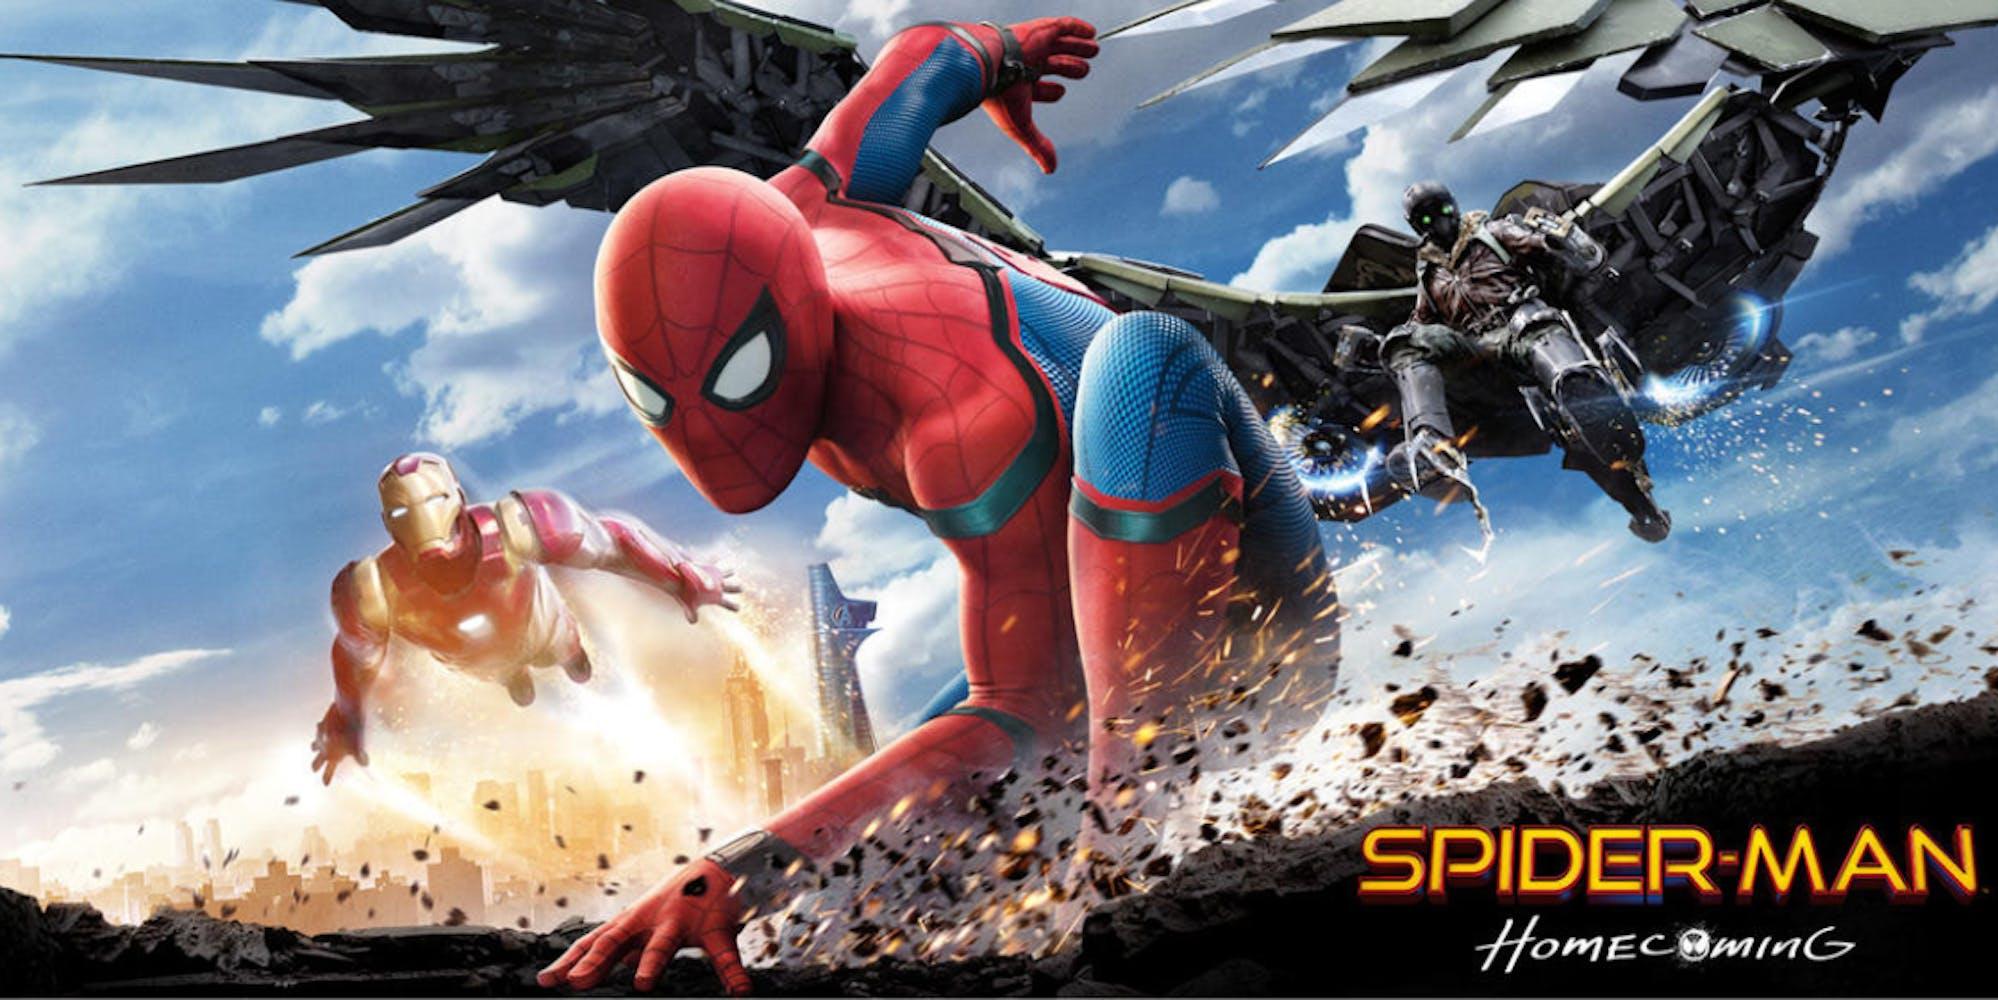 CGI Usage In Spiderman Homecoming